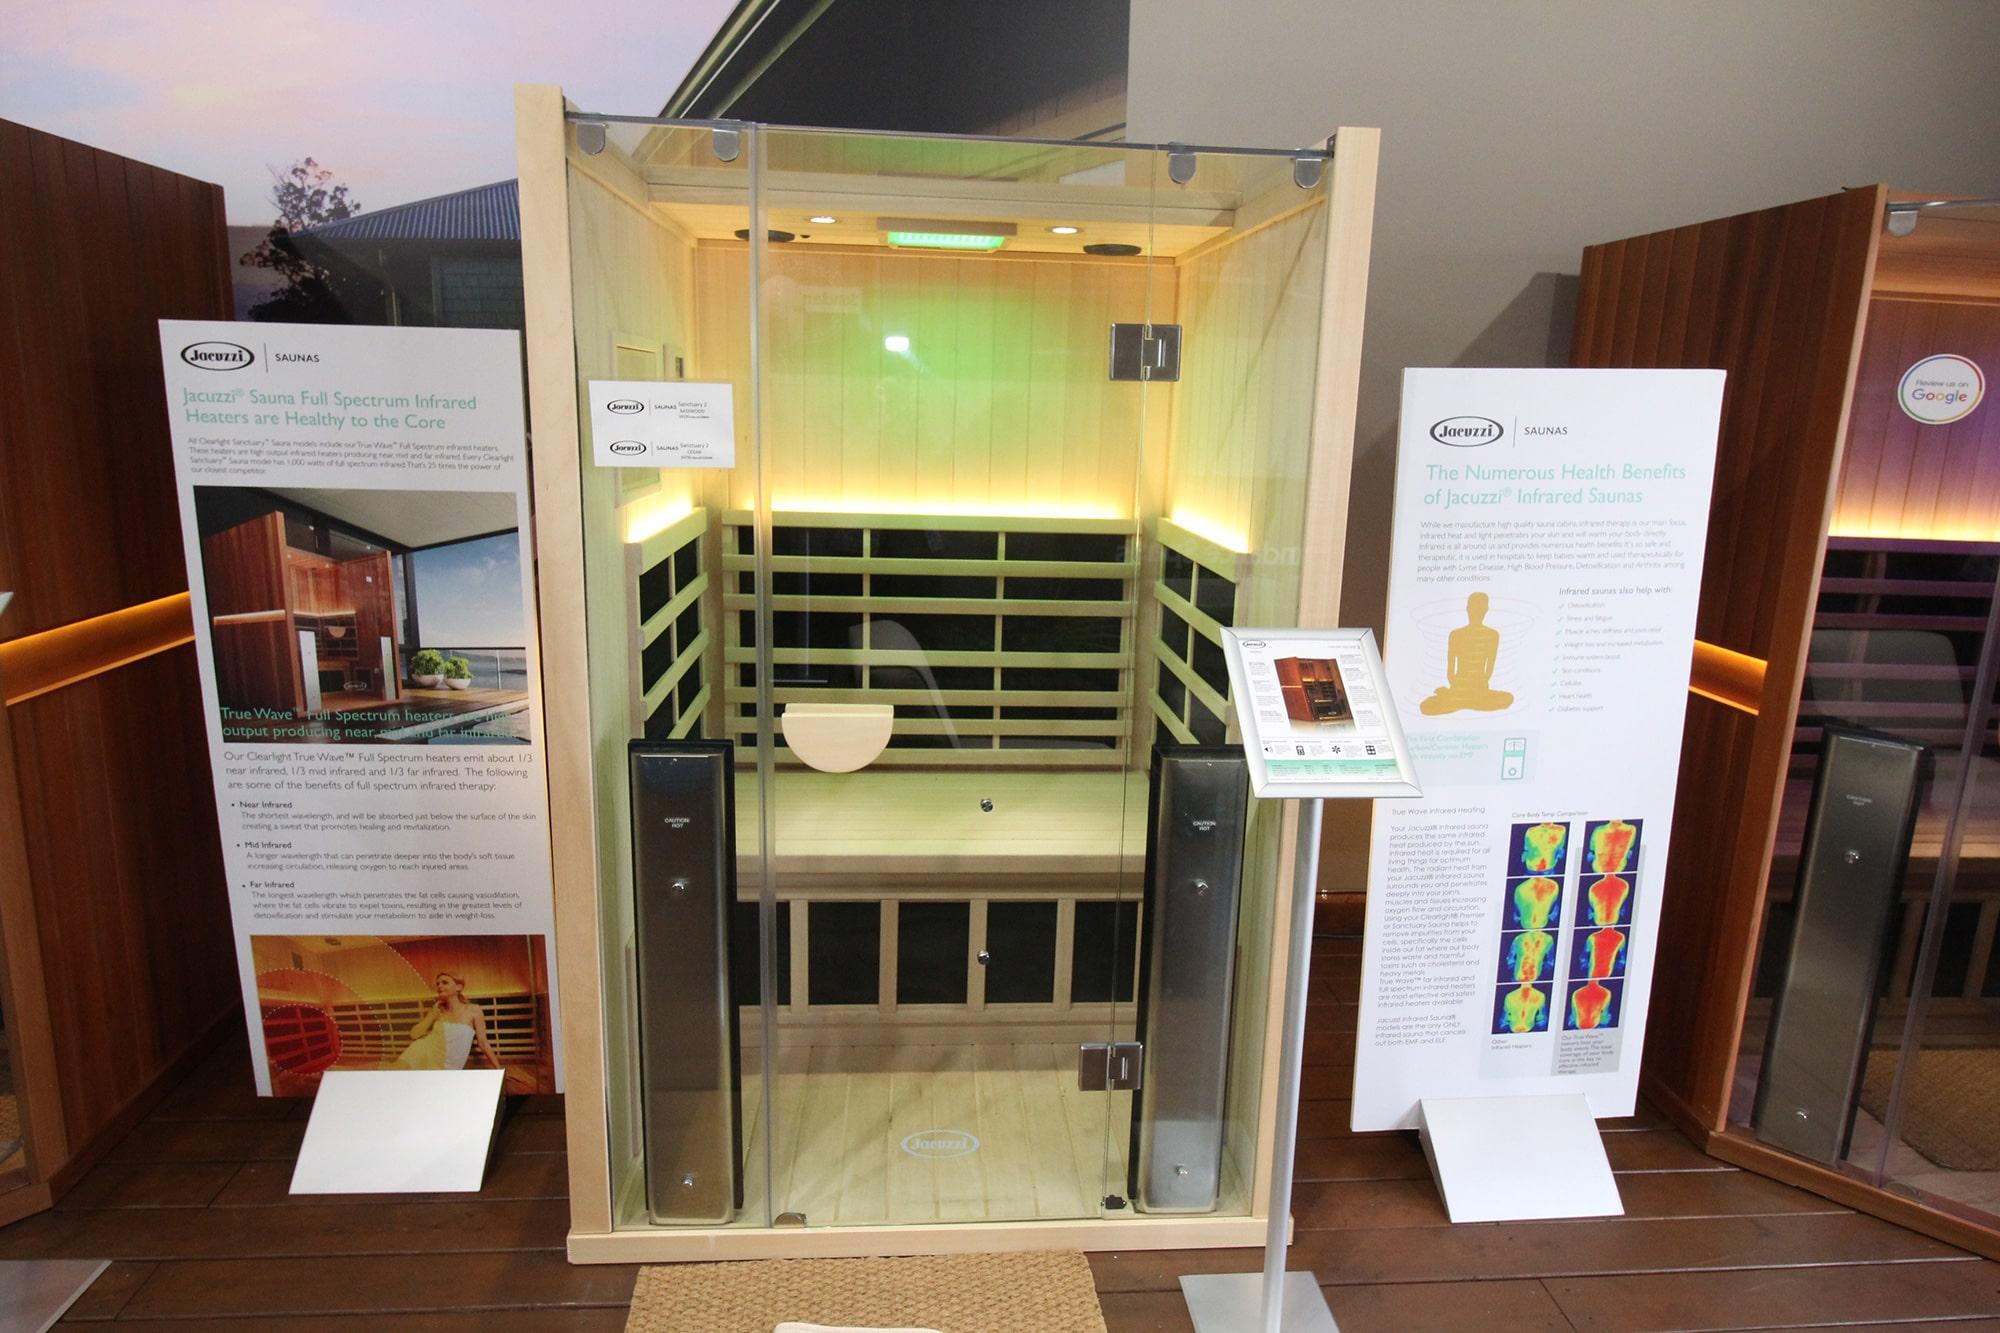 Jacuzzi Kitchener Infrared Sauna